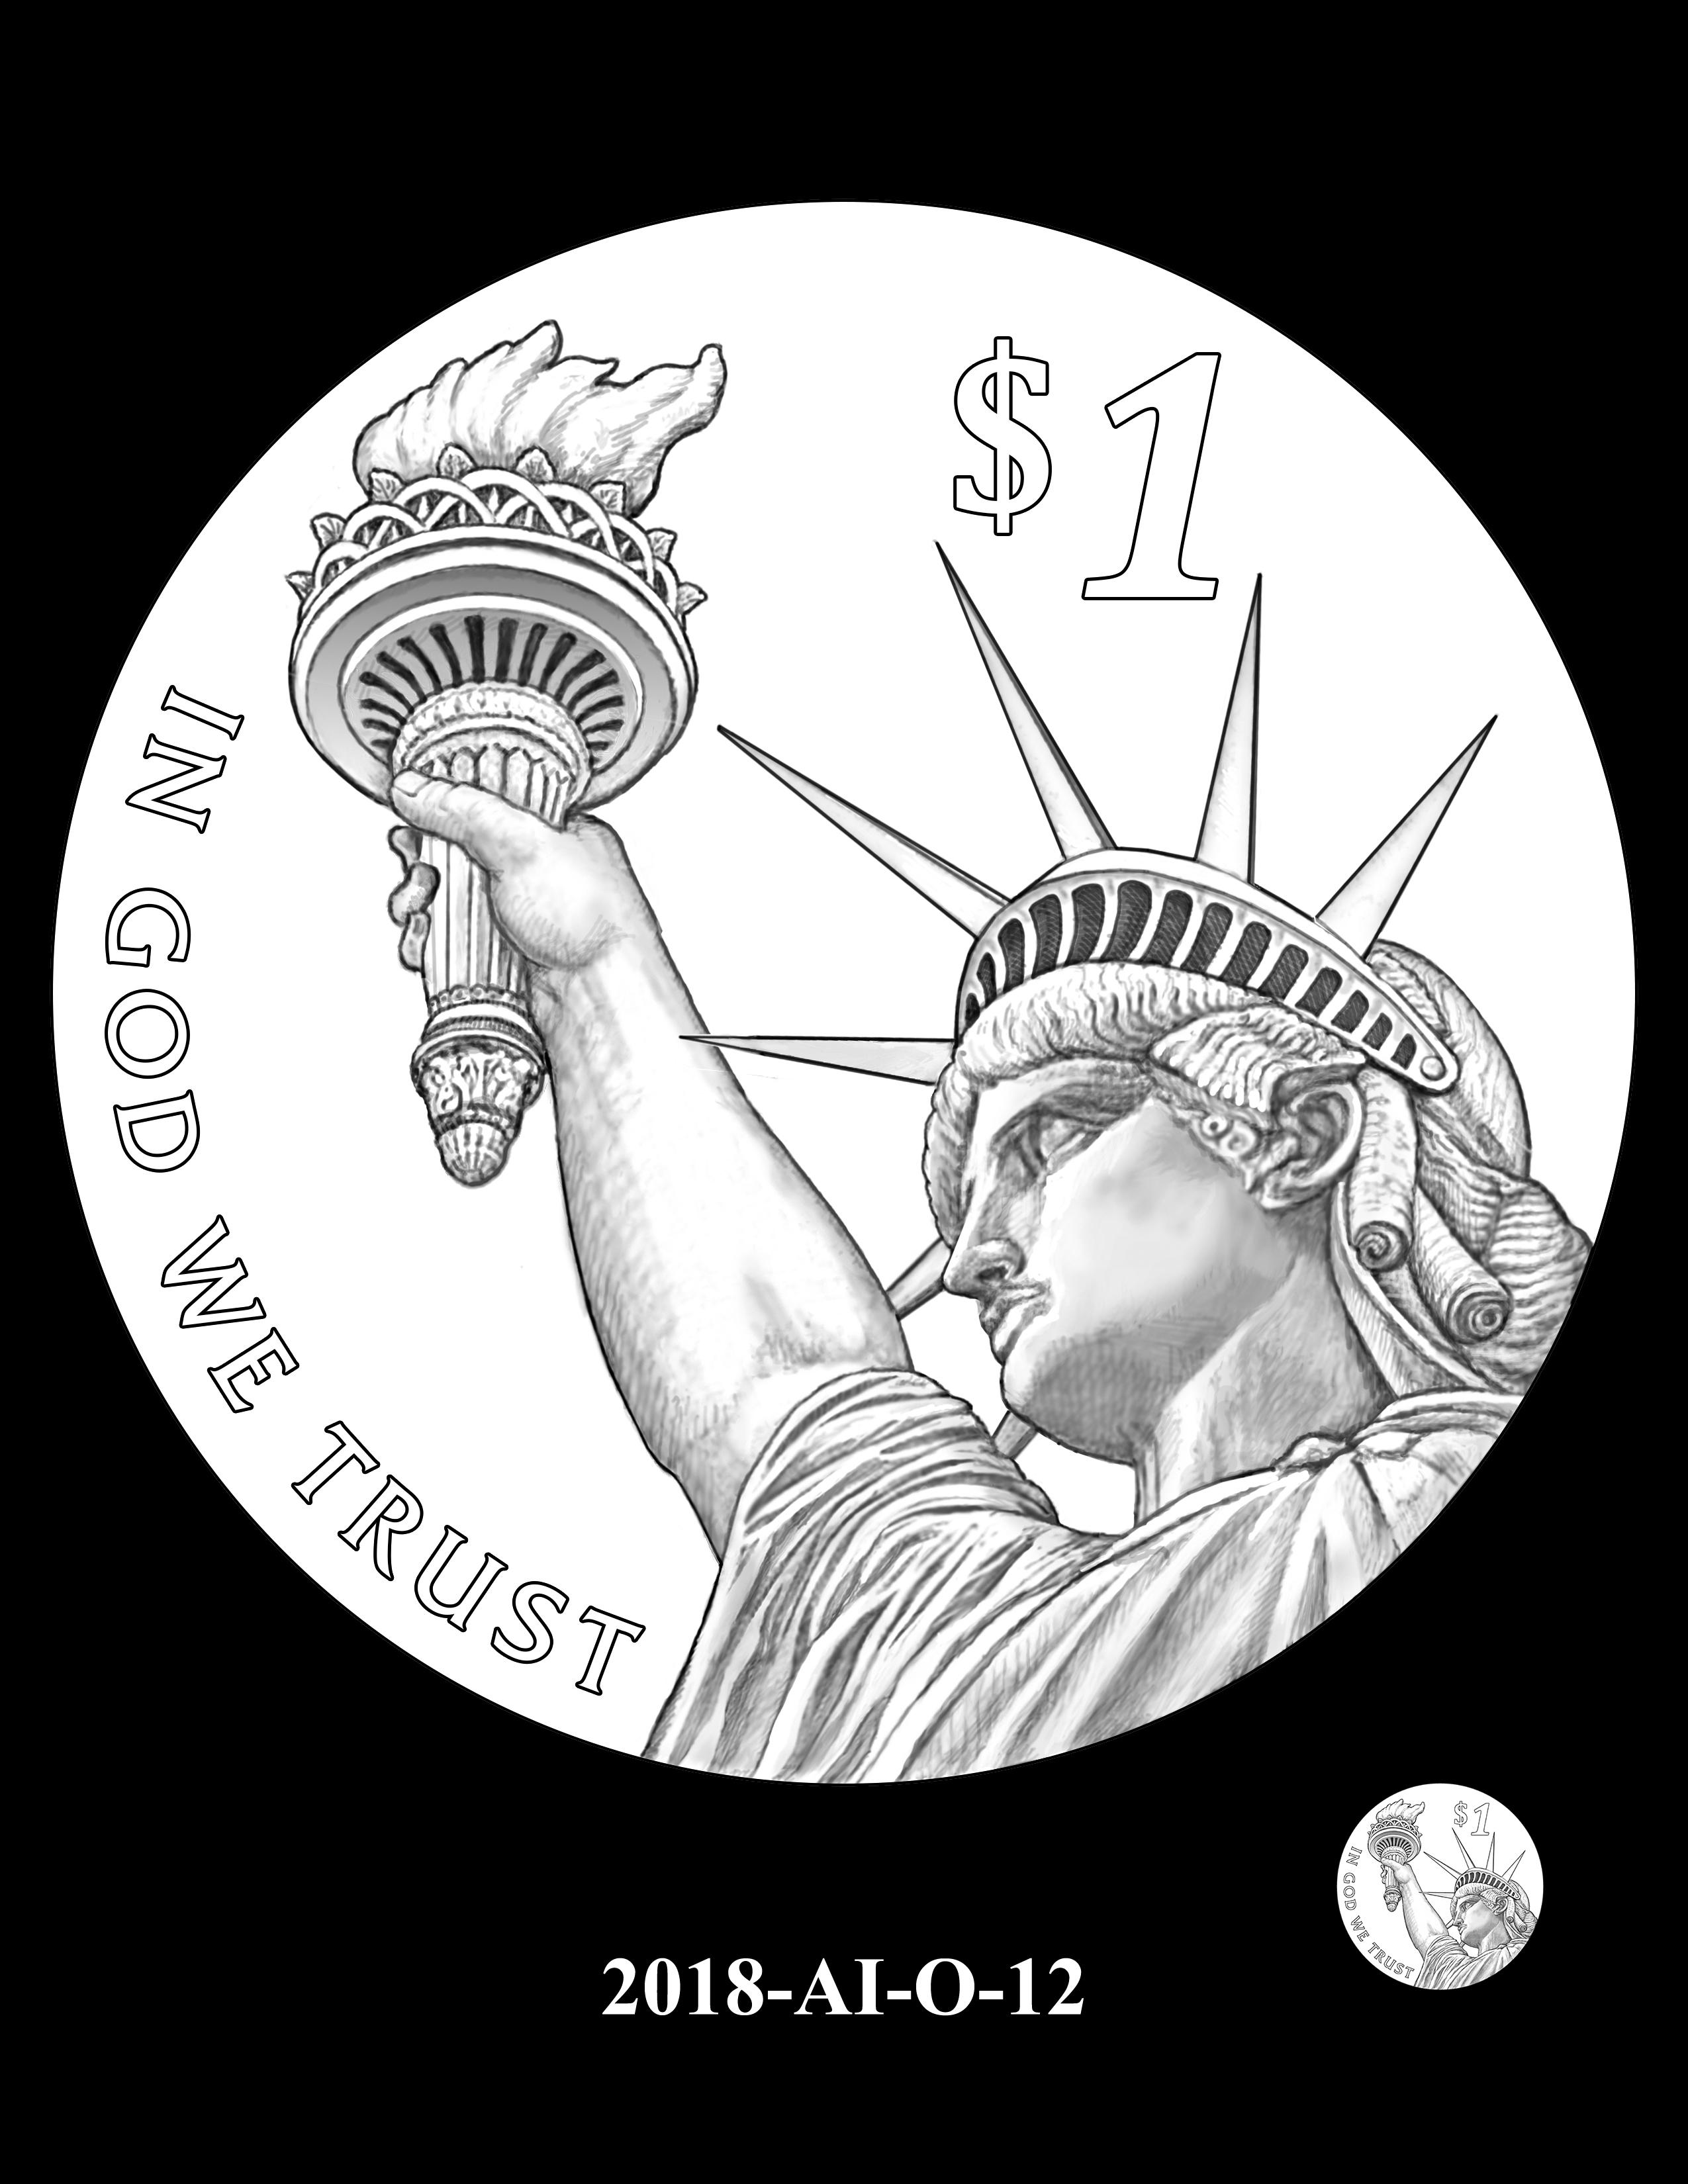 2018-AI-O-12 -- 2018 American Innovation $1 Coin